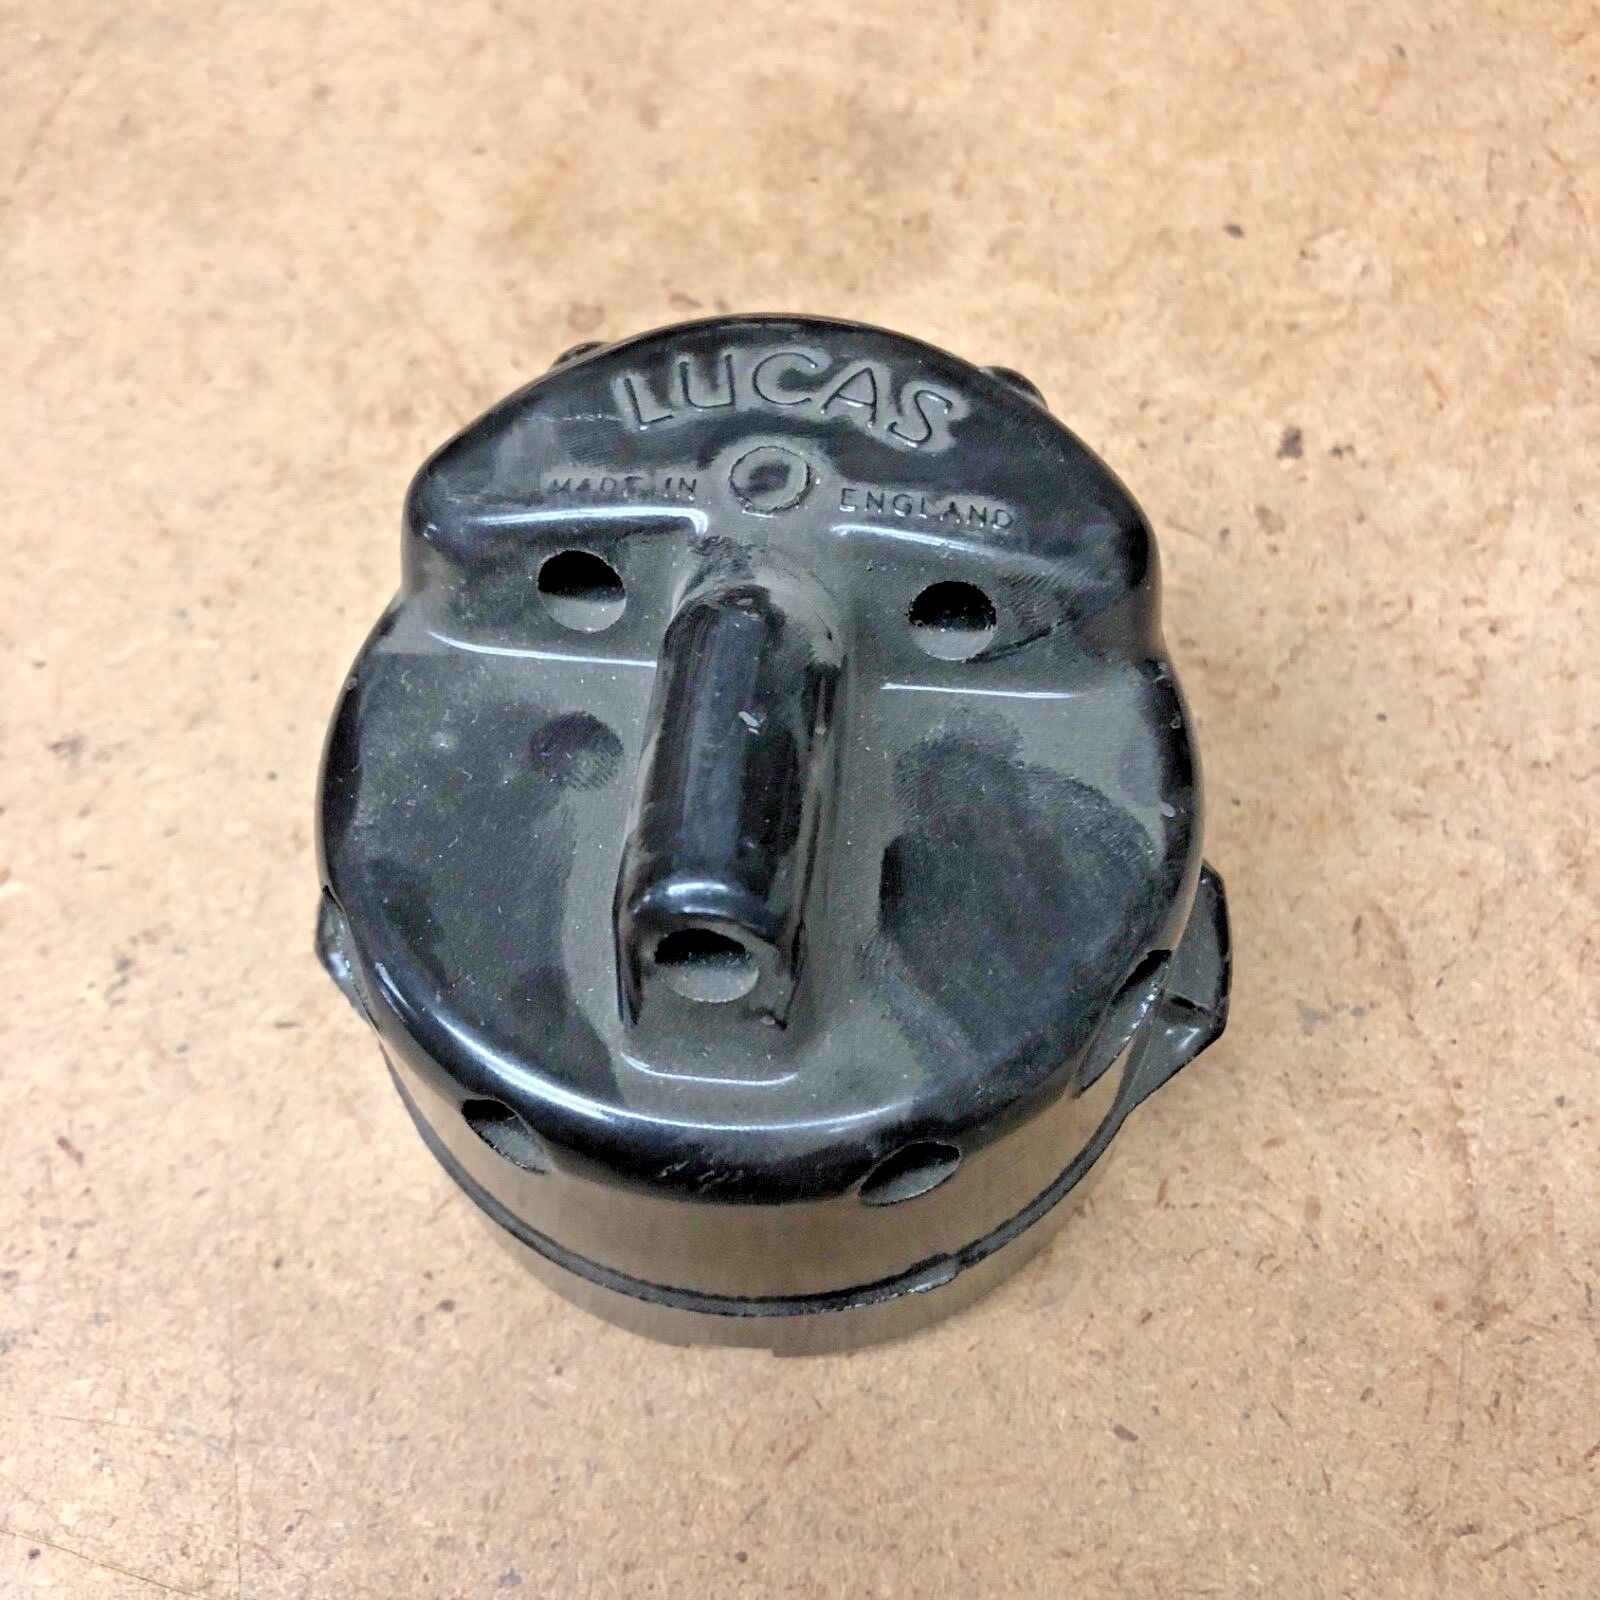 vintage car \u0026 truck parts ignition systems on auto parts loglucas distributor cap, aston martin \u0026 jaguar